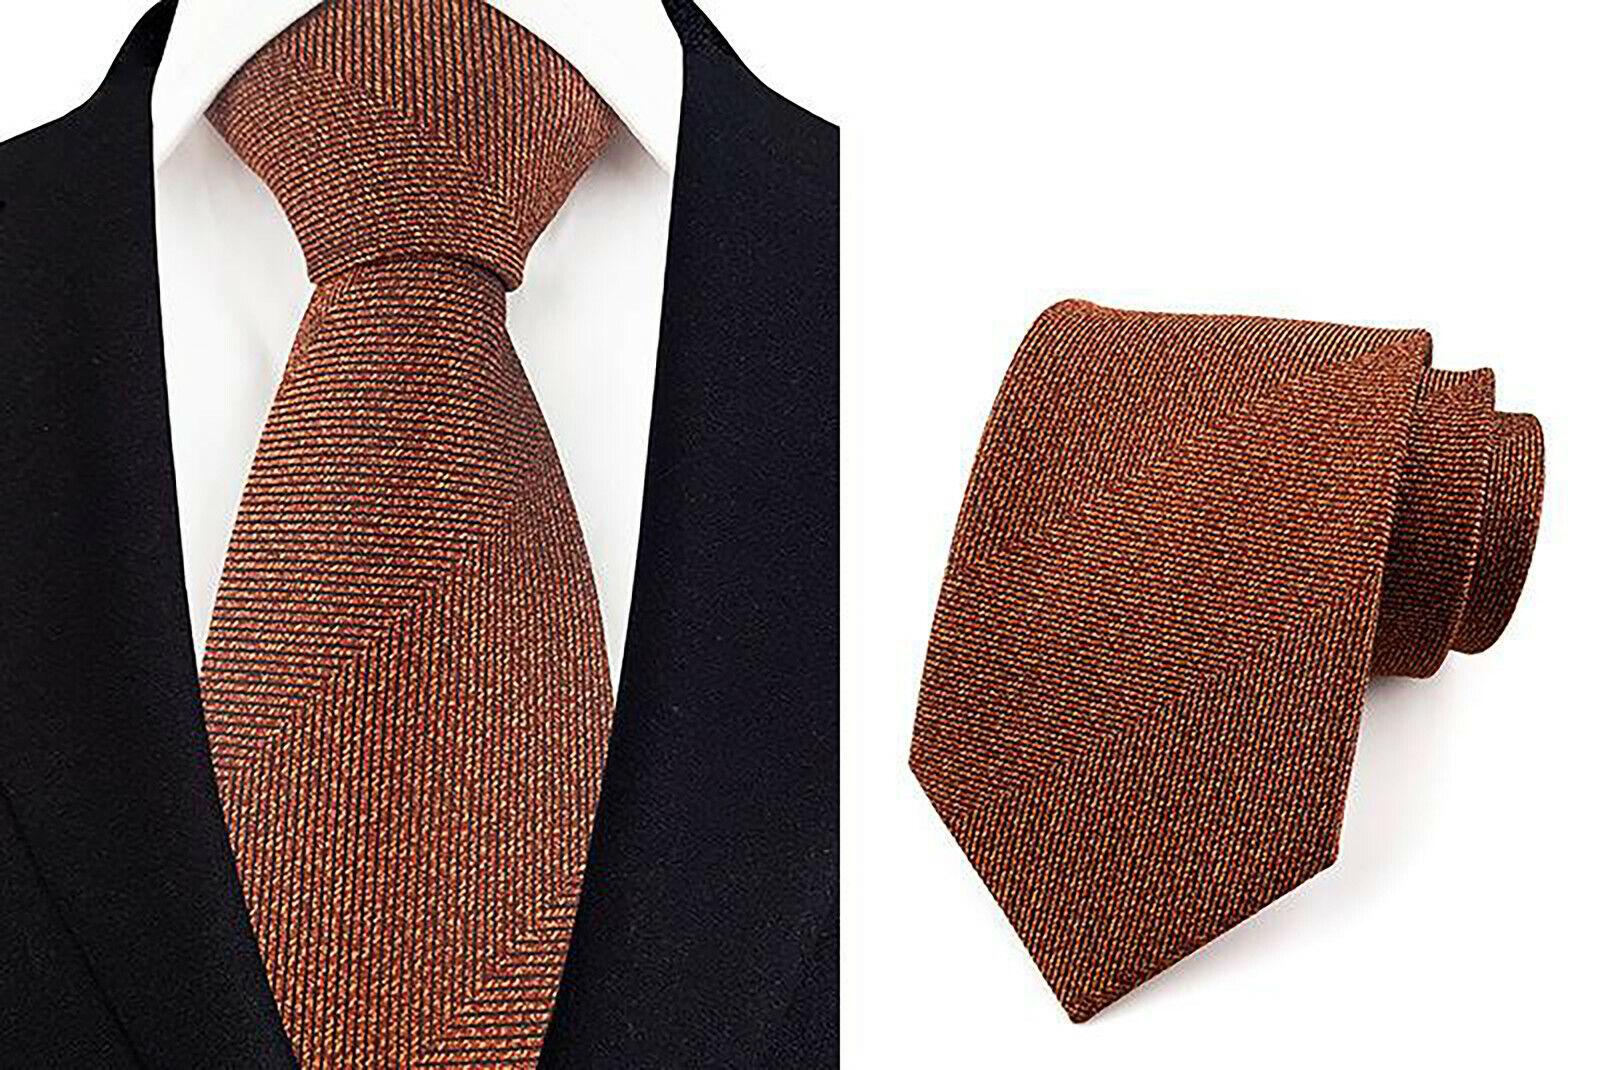 Tie Orange-Brown Handmade 100% Silk Wedding 8cm Width Tie